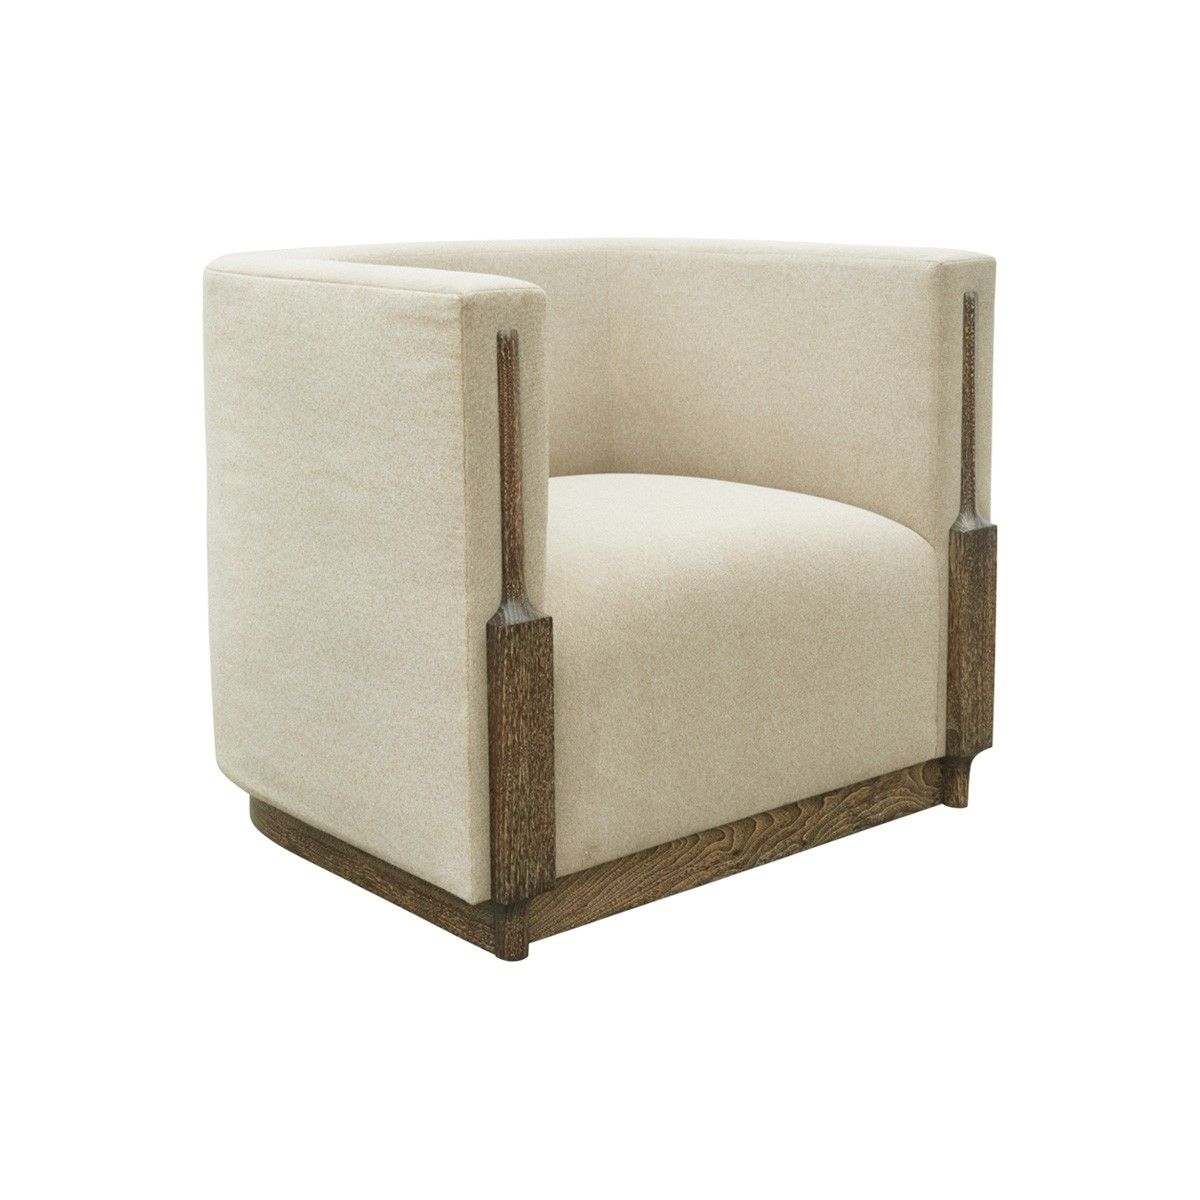 swivel lounge chairs la rocking chair store viyet designer furniture seating michael berman limited perry